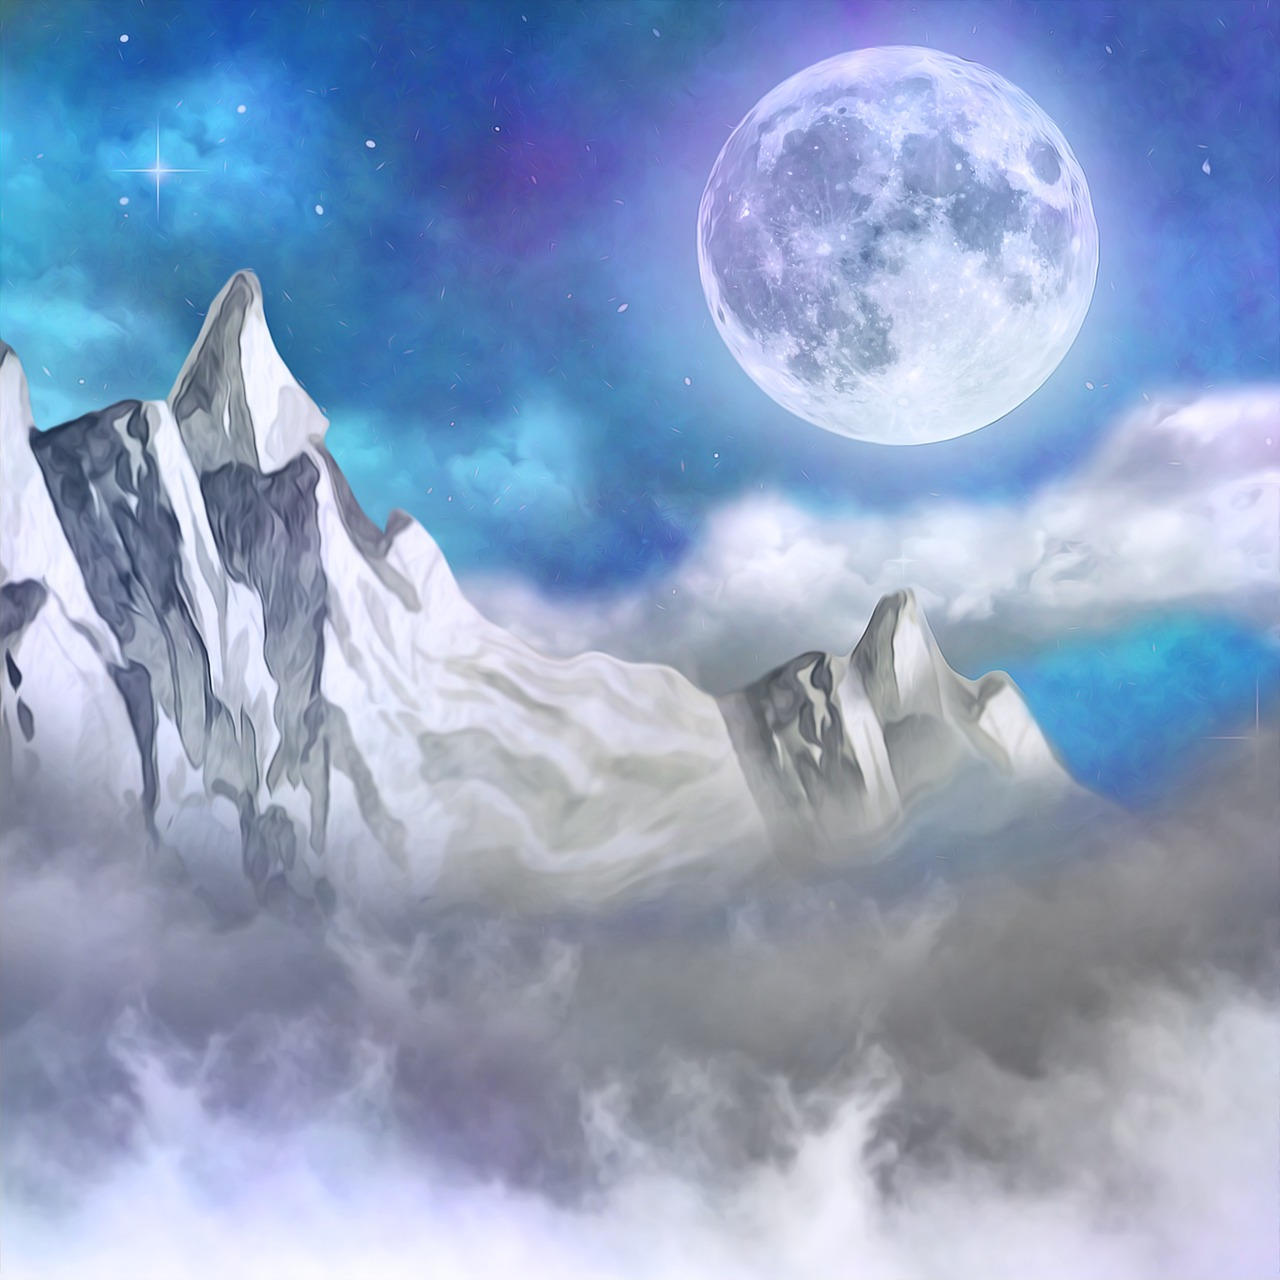 volle maan van 28 januari